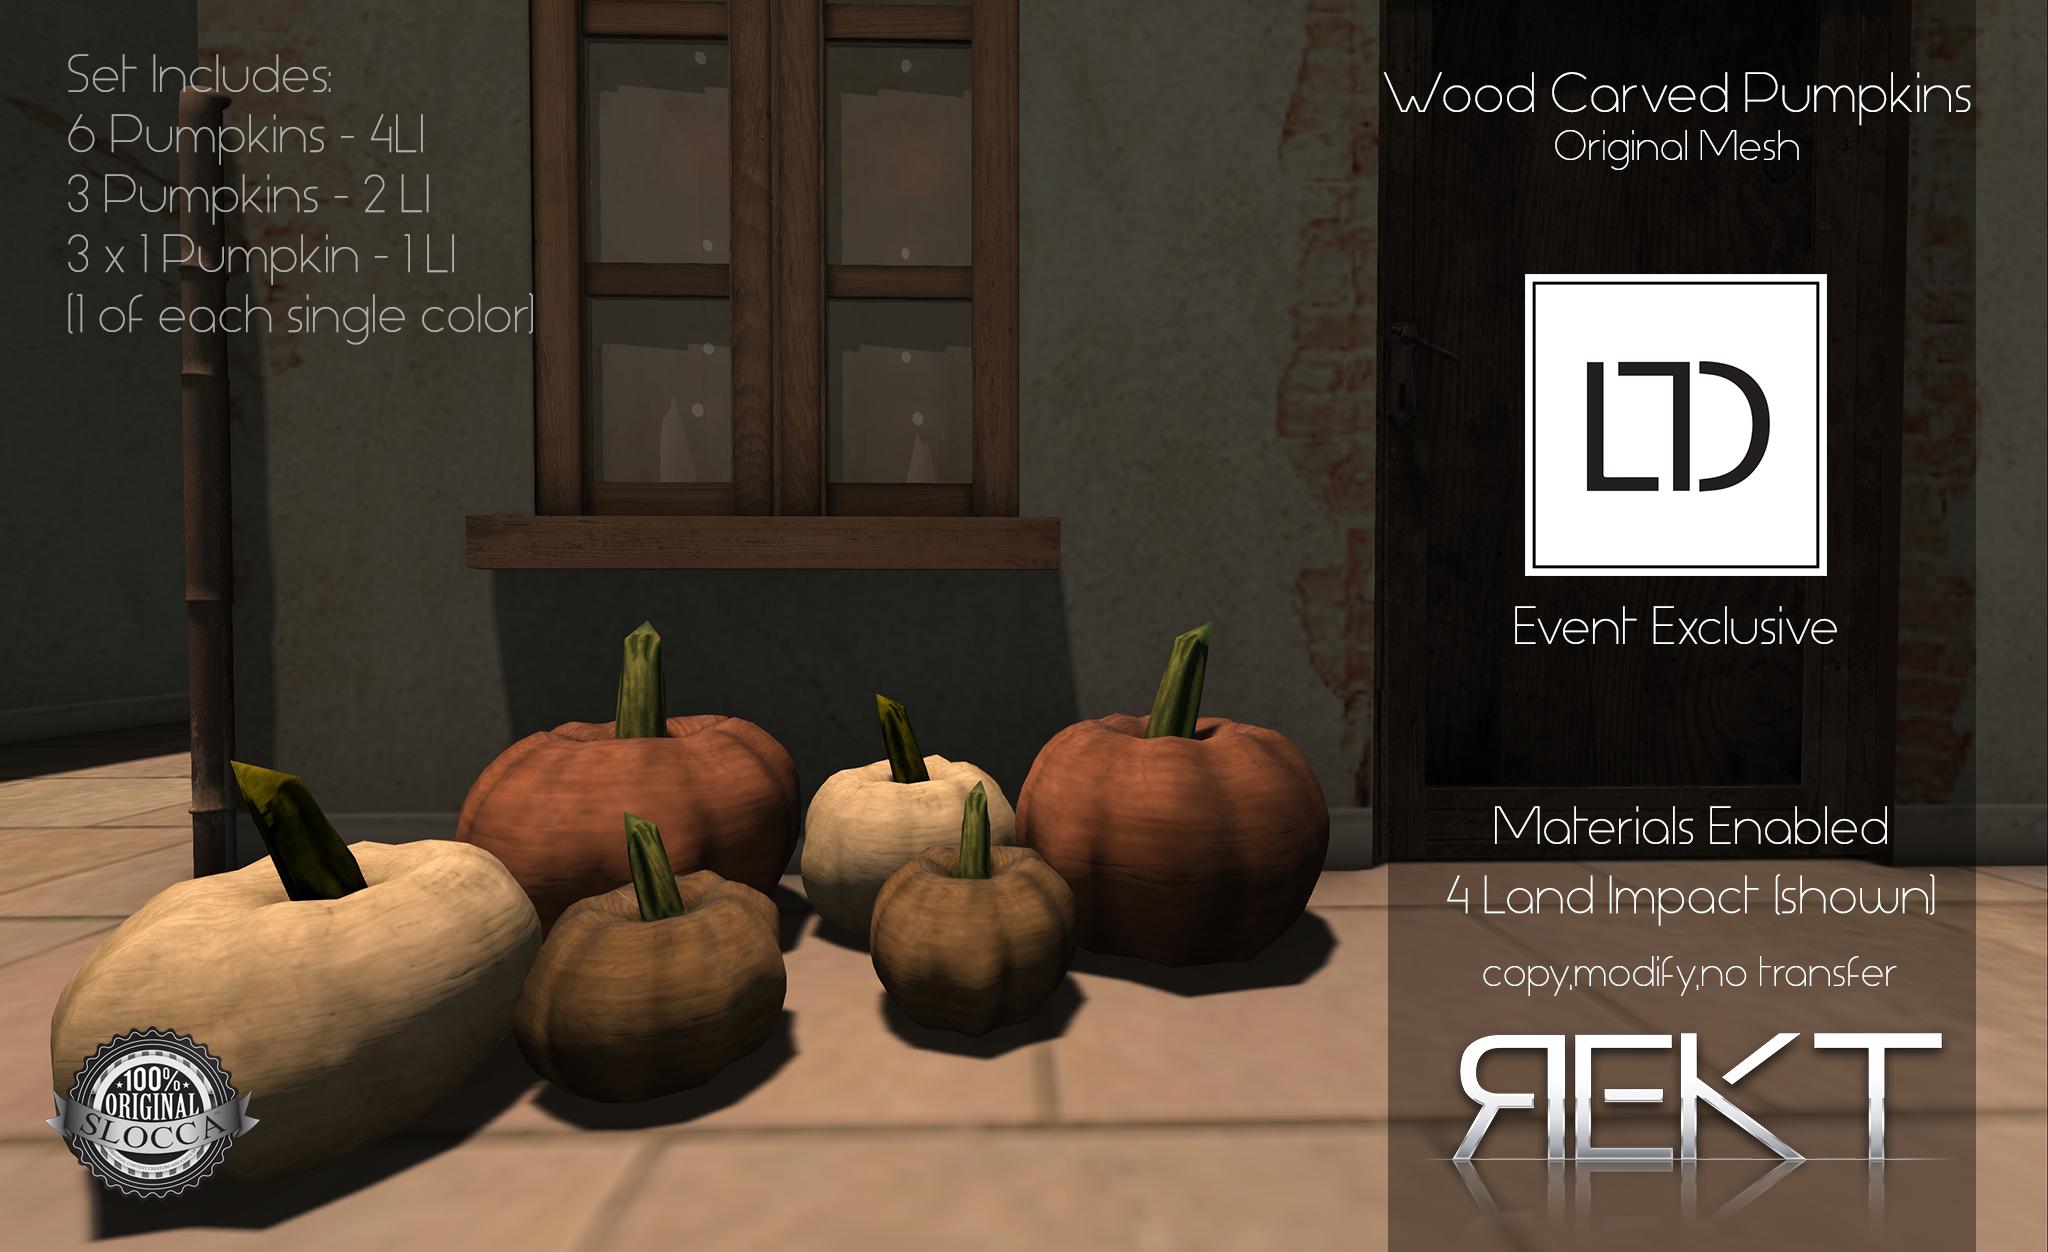 Rekt Wood Carrved Pumpkins